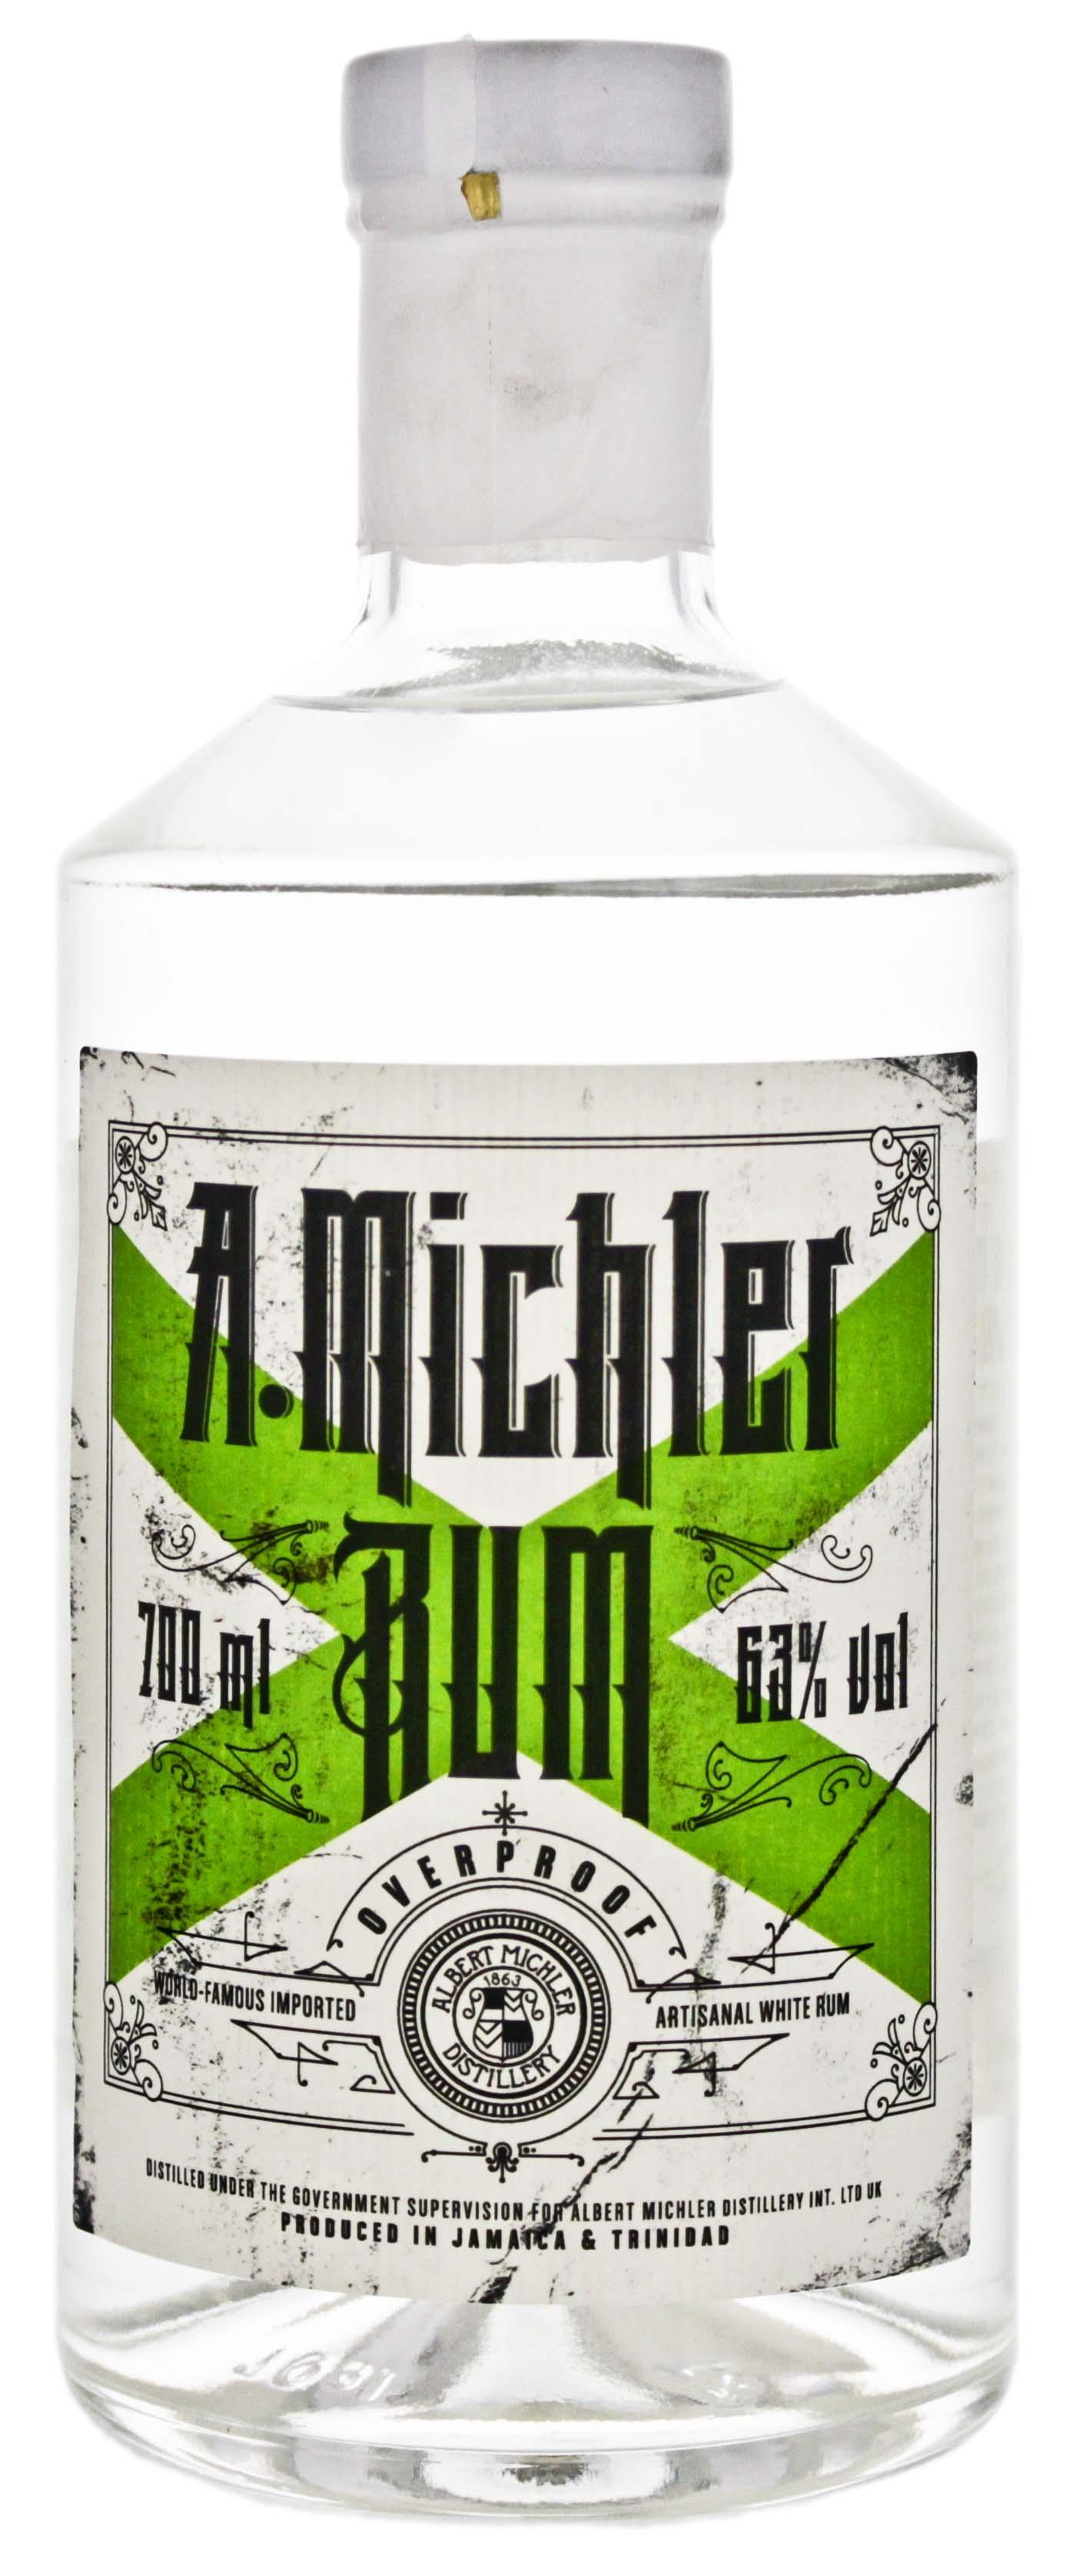 Michlers Overproof Artisanal White Rum 0,7L